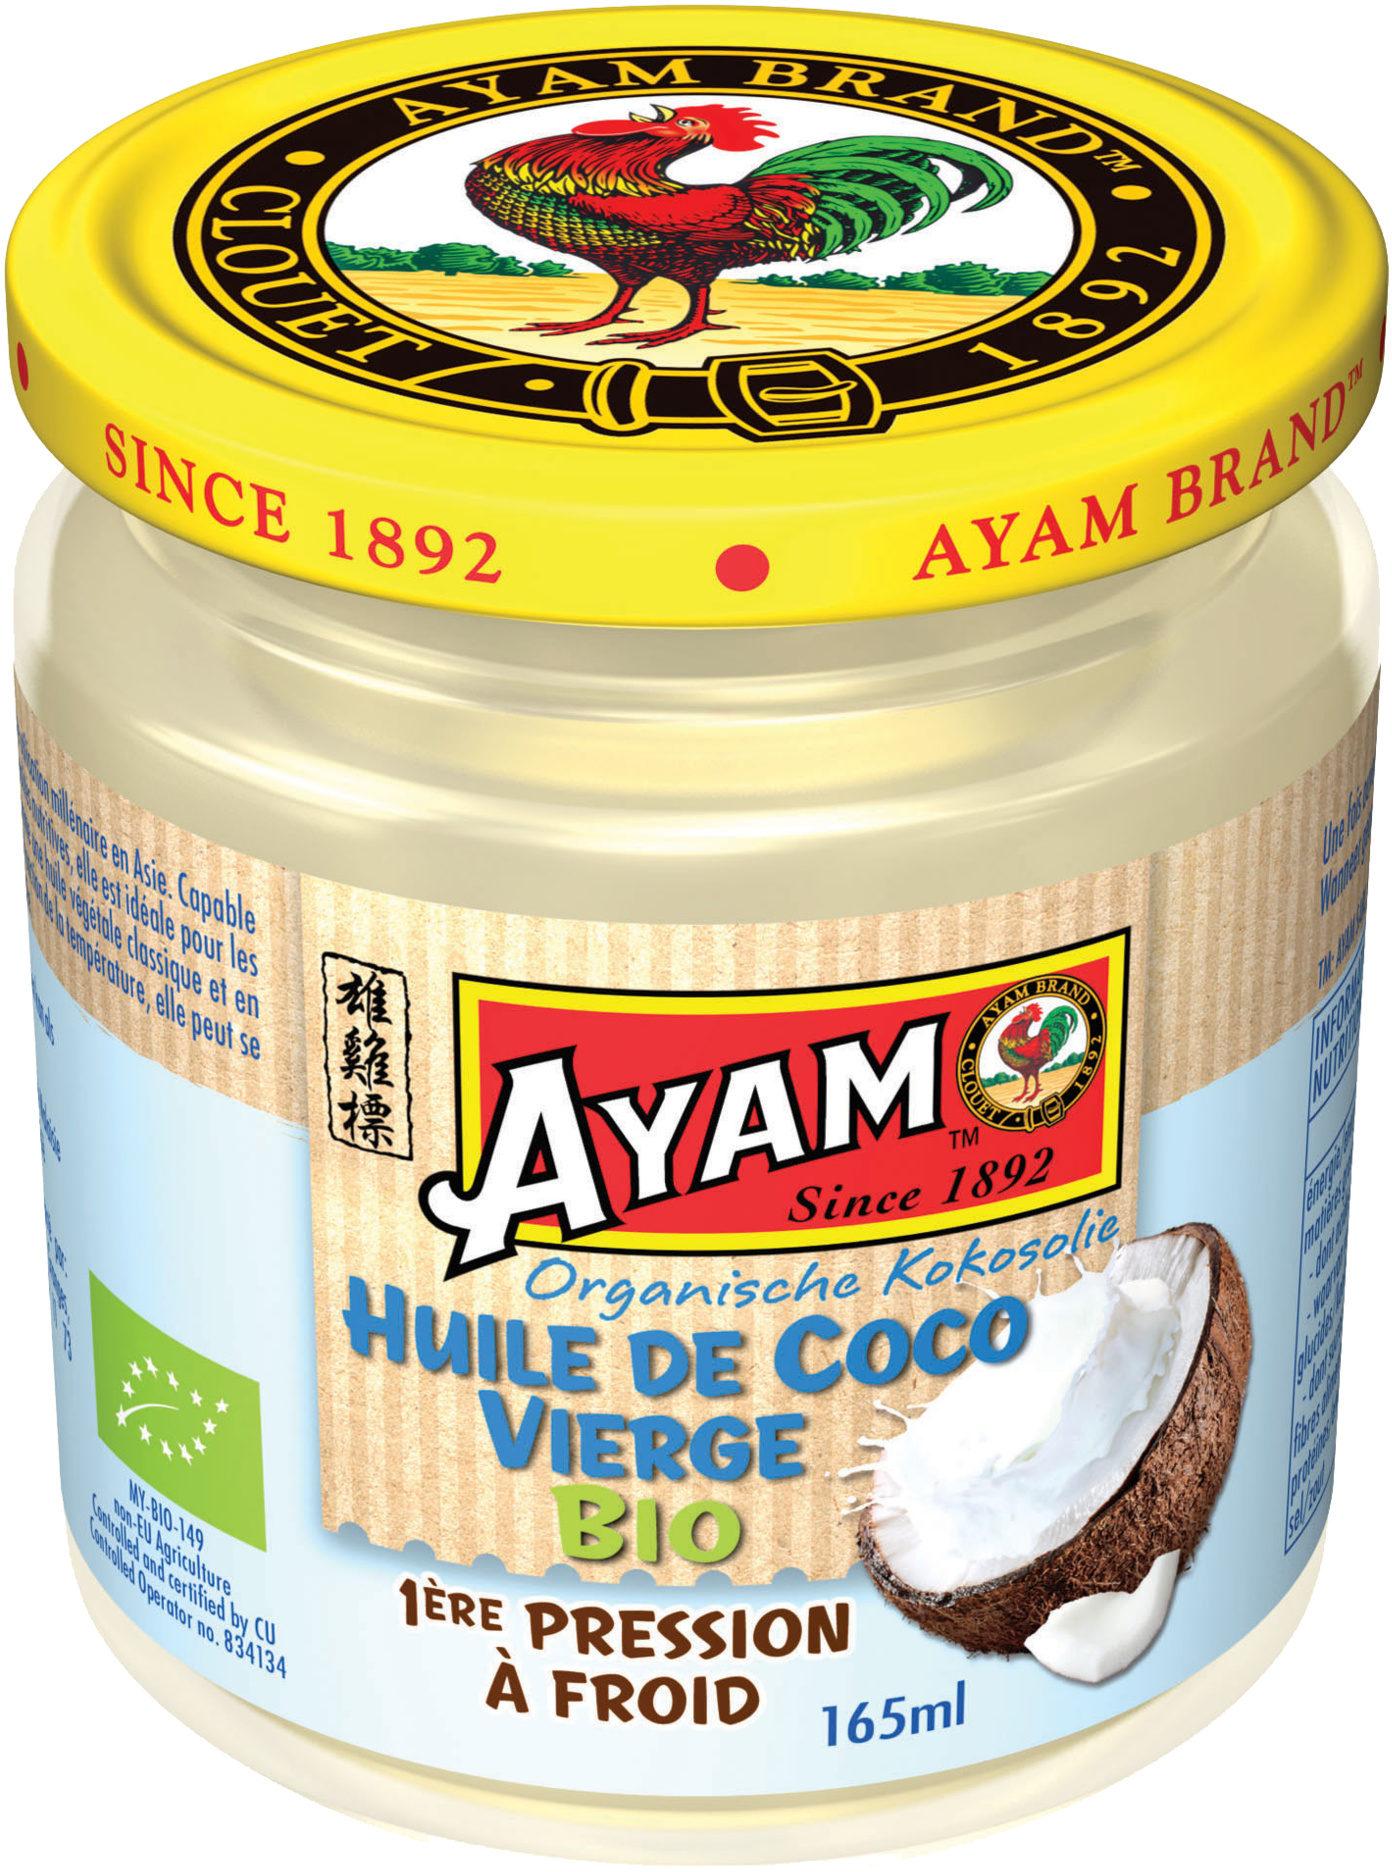 Huile de coco vierge bio Ayam™ - Product